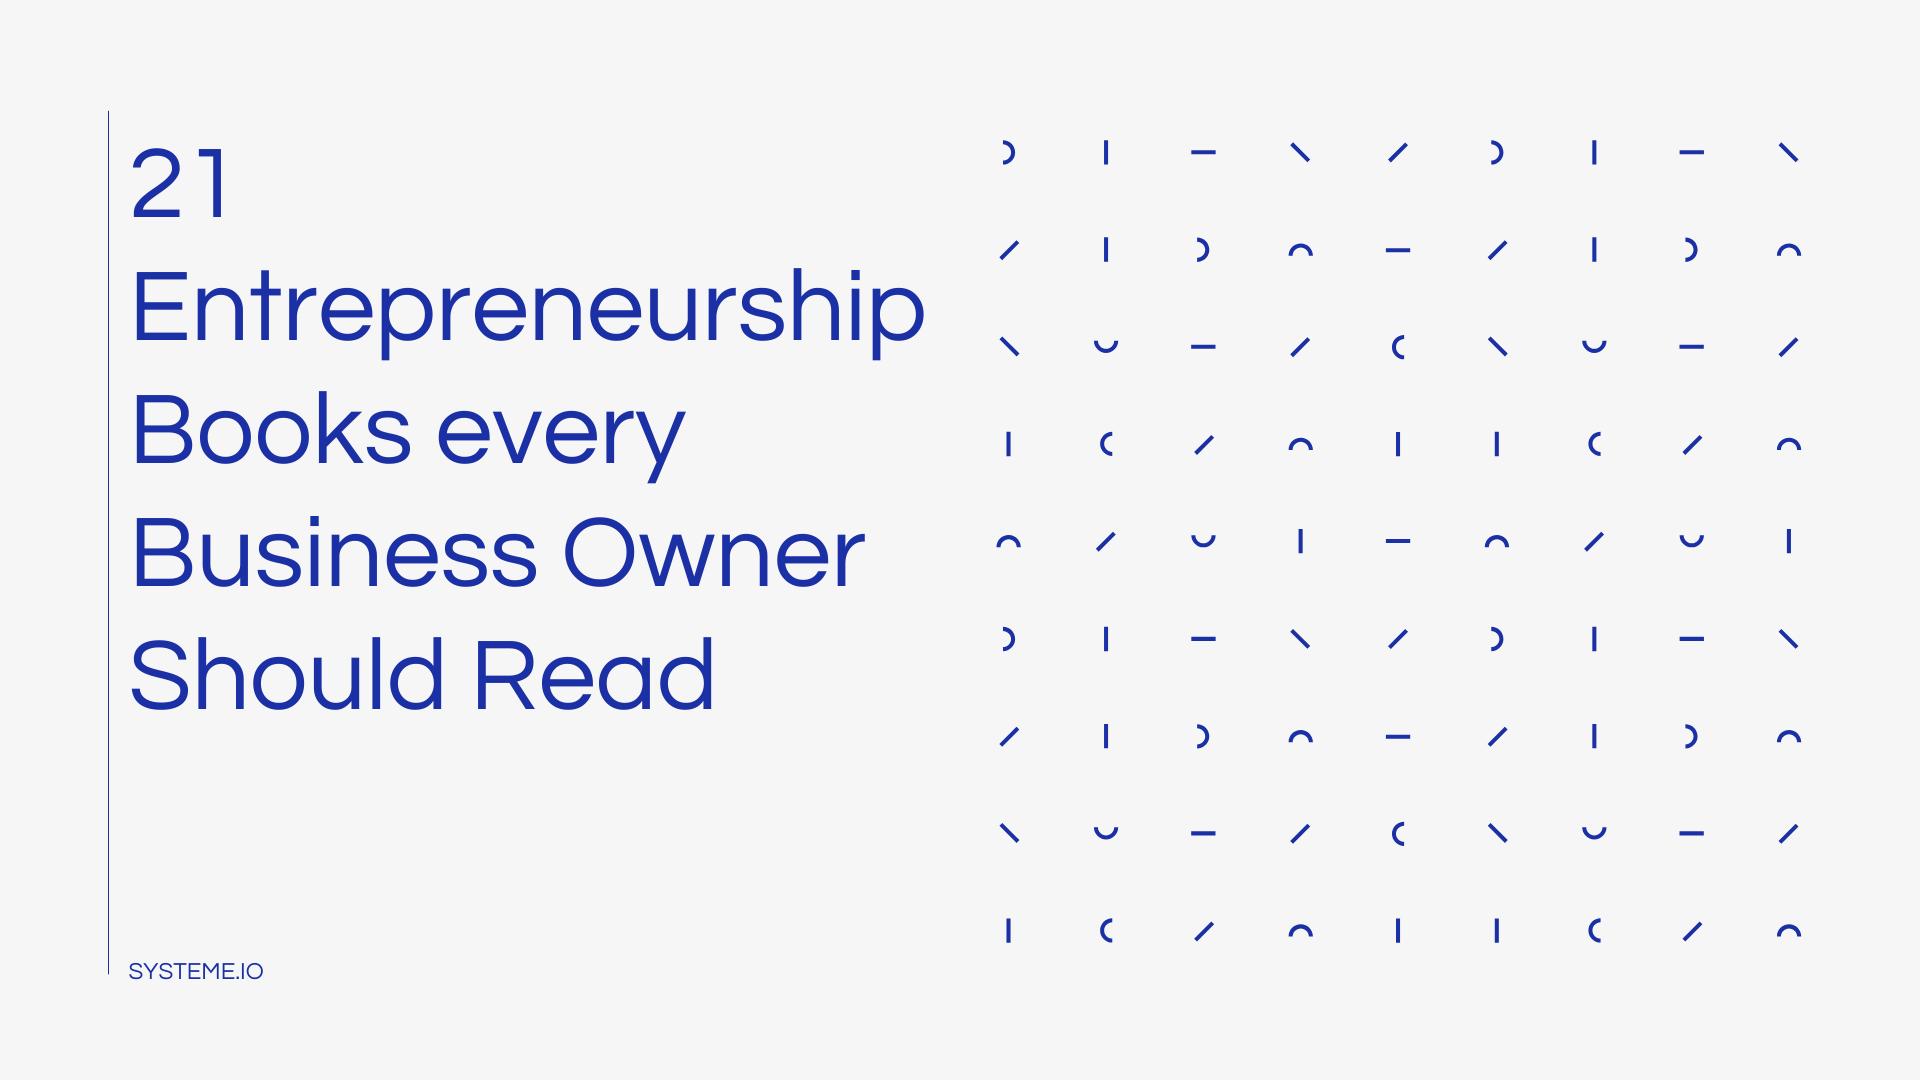 21 entrepreneurship Books every Business Owner Should Read